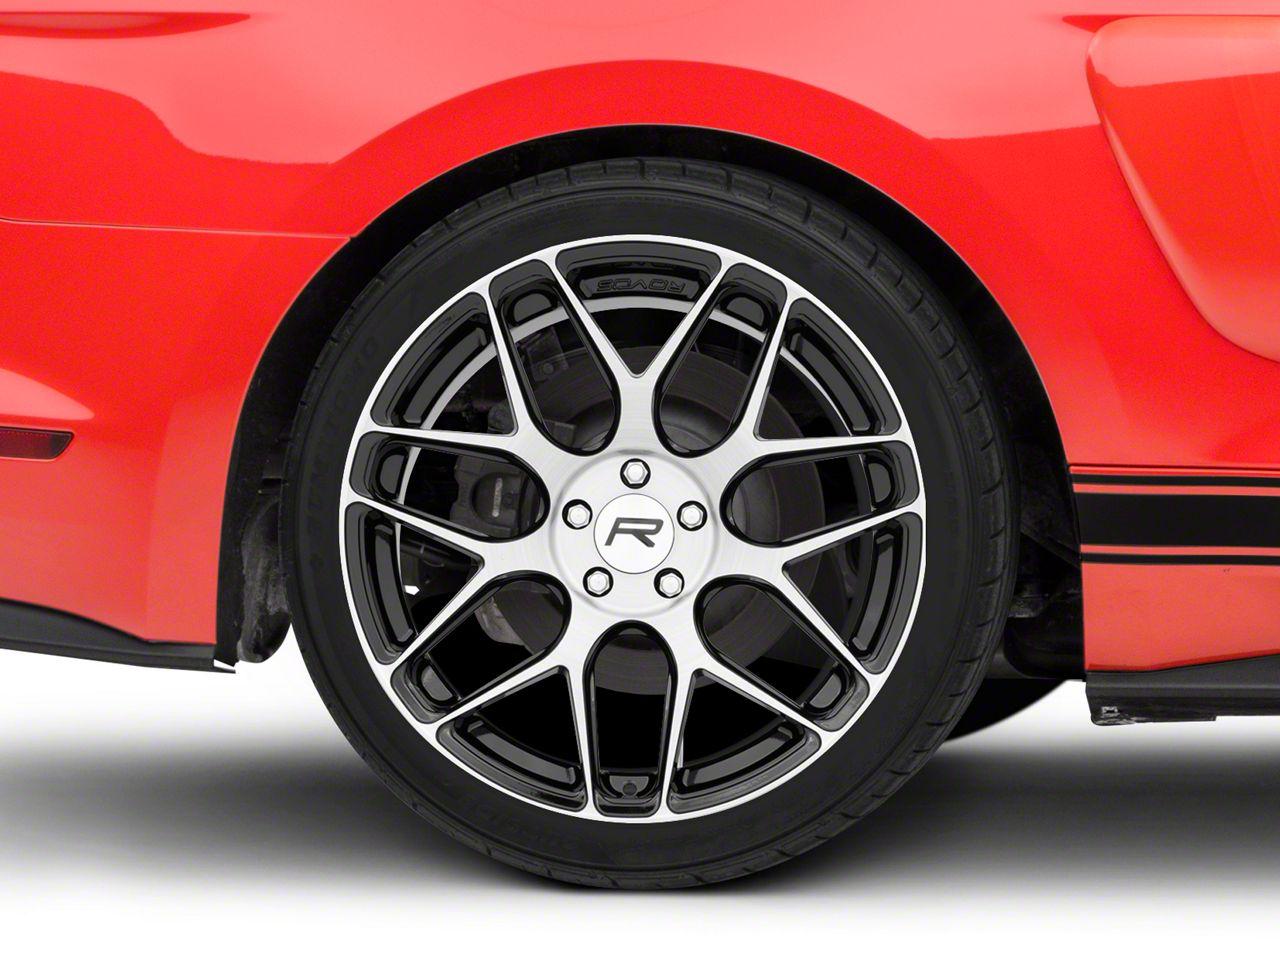 Rovos Pretoria Gloss Black Machined Wheel - 20x10 - Rear Only (15-19 GT, EcoBoost, V6)